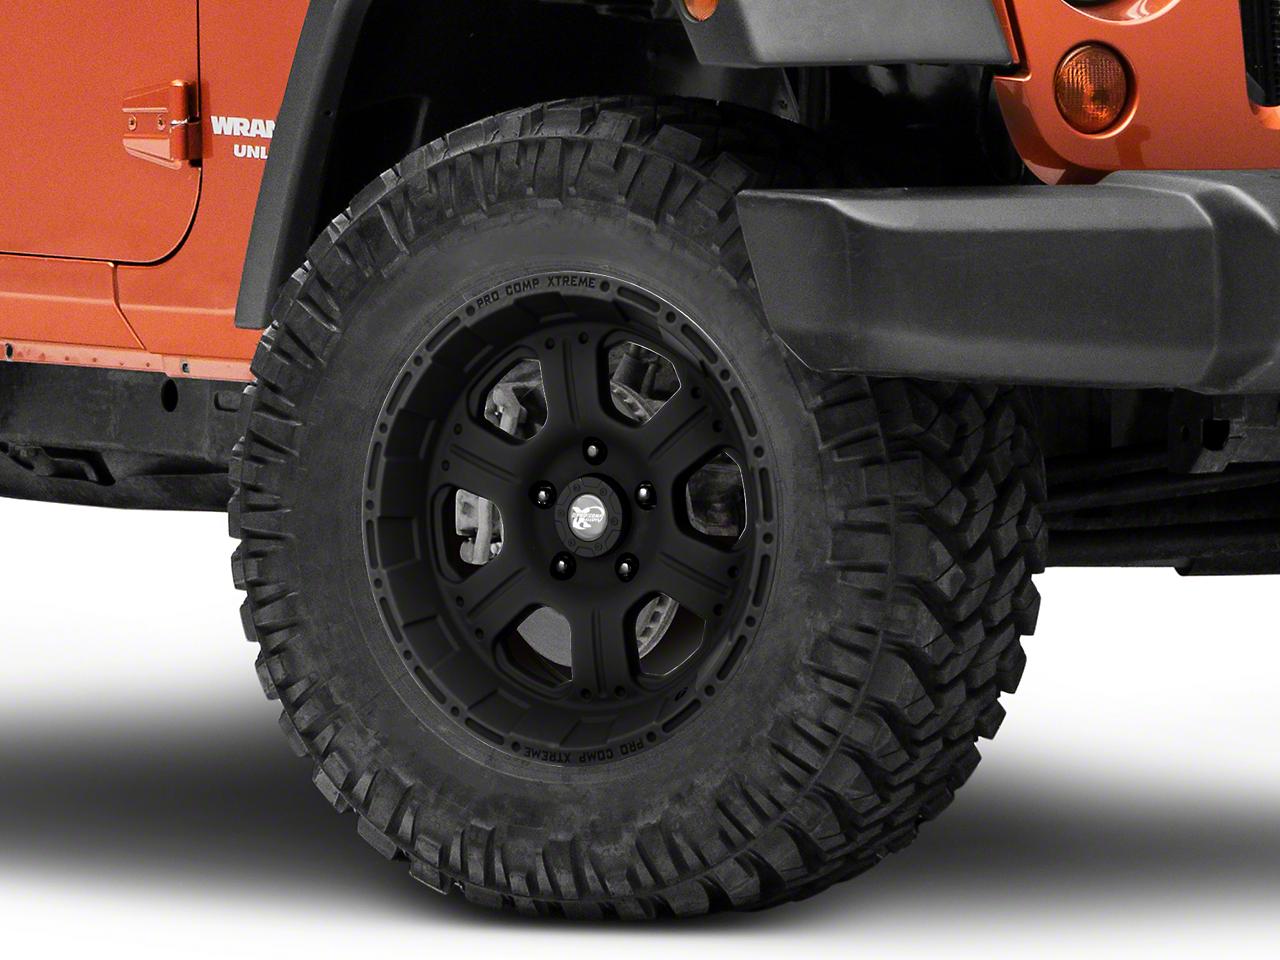 Pro Comp Alloy Series 7089 Flat Black Wheel - 18x9 (07-18 Jeep Wrangler JK; 2018 Jeep Wrangler JL)